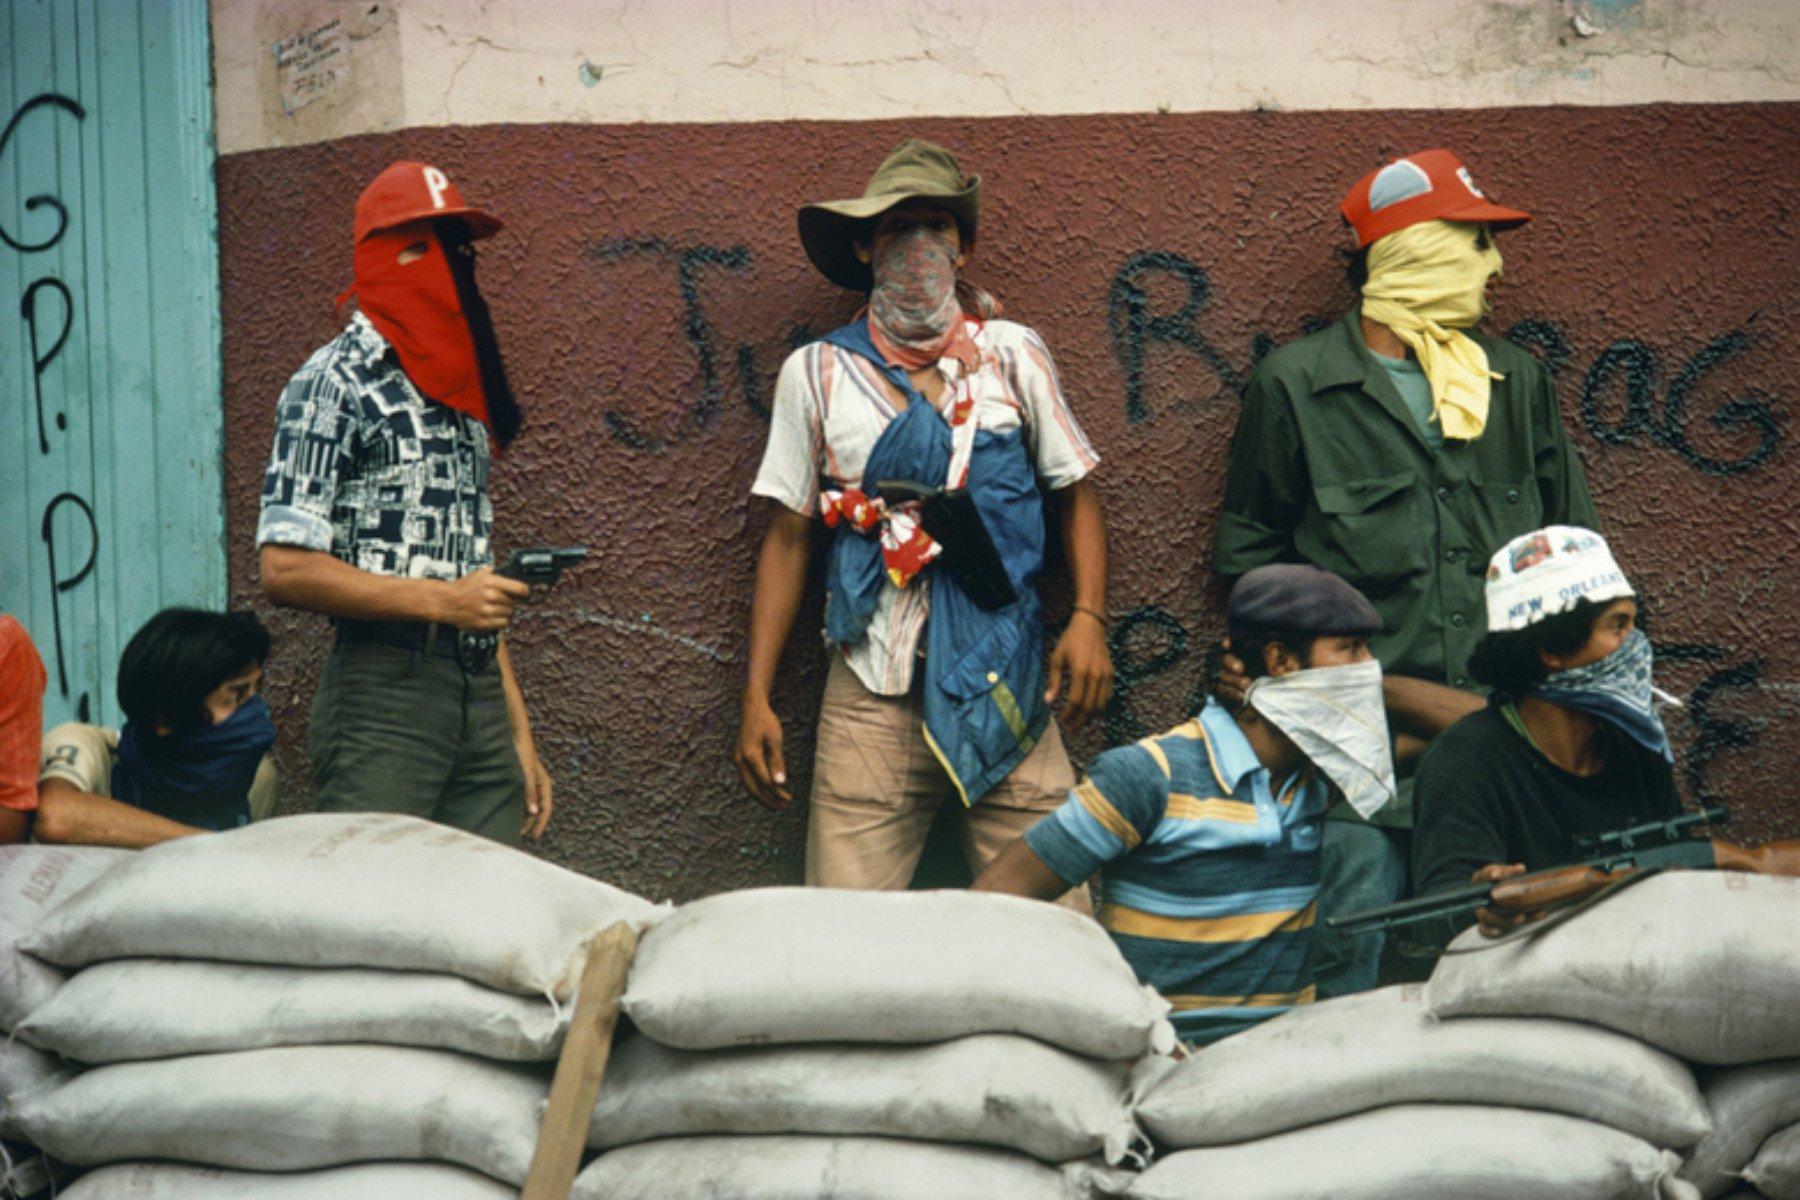 Muchachos warten auf den Gegenangriff der Nationalgarde. Matagalpa, Nicaragua